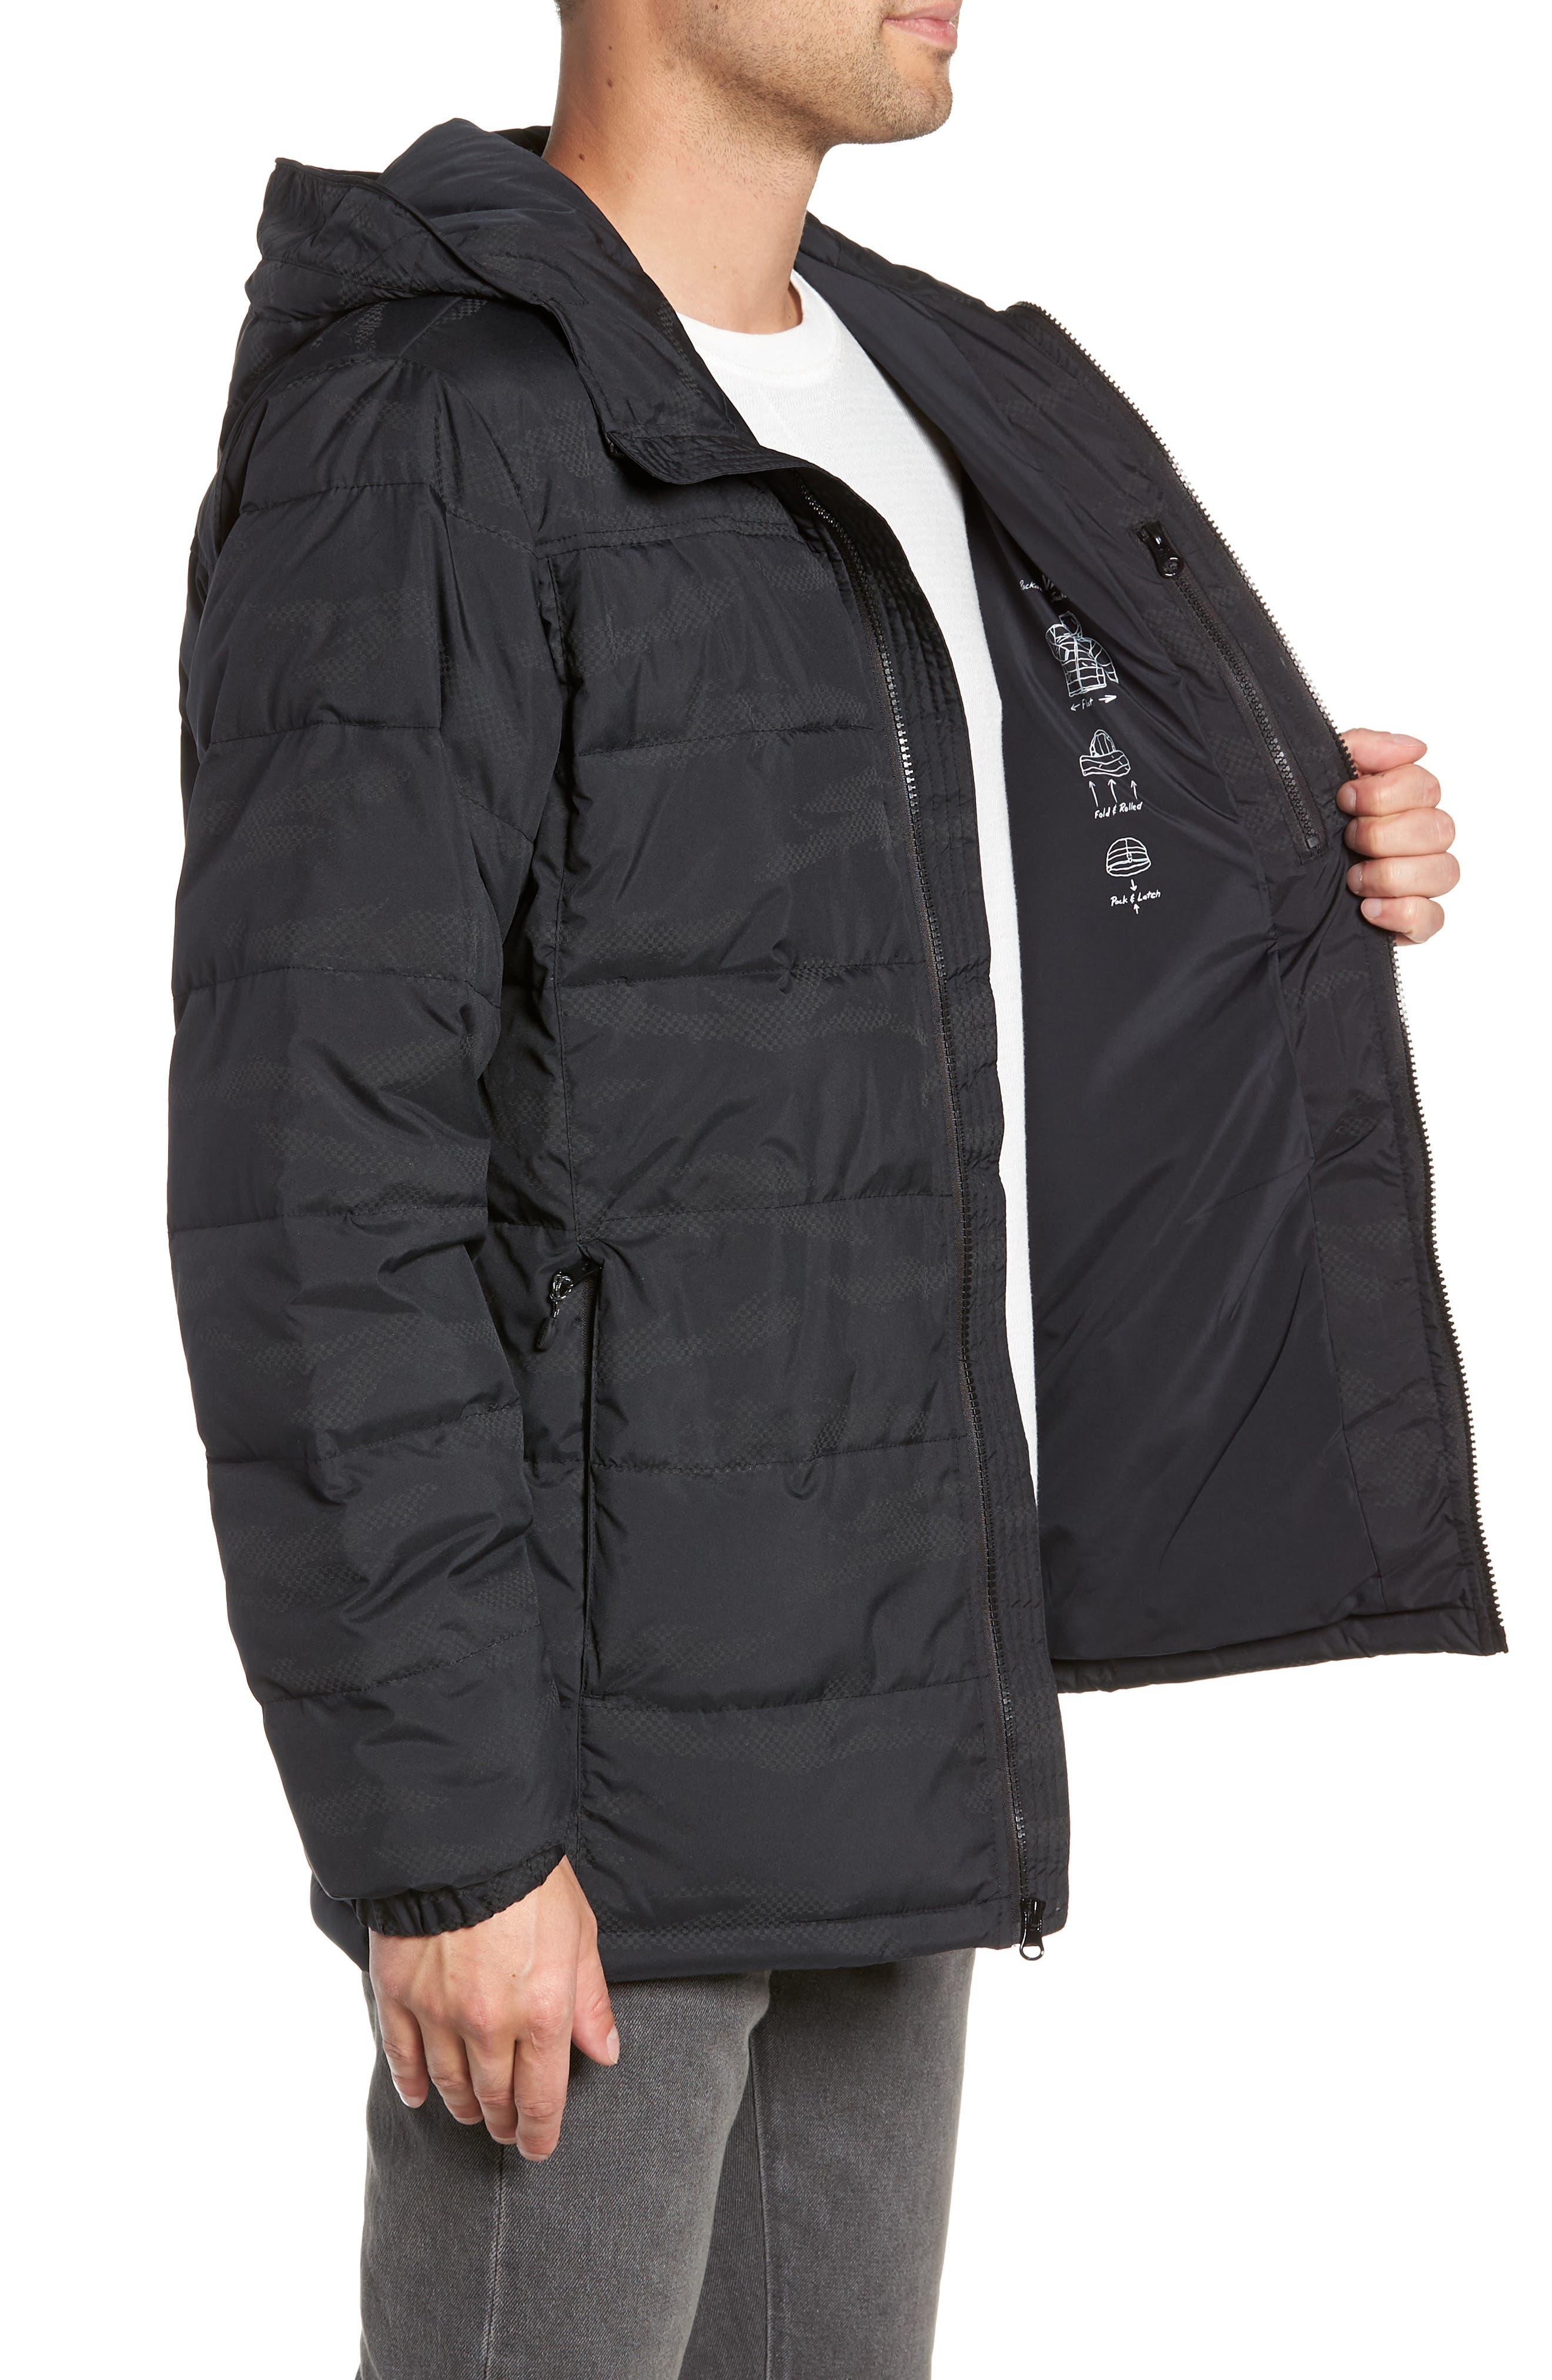 Woodcrest MTE Jacket,                             Alternate thumbnail 3, color,                             BLACK REFLECTIVE